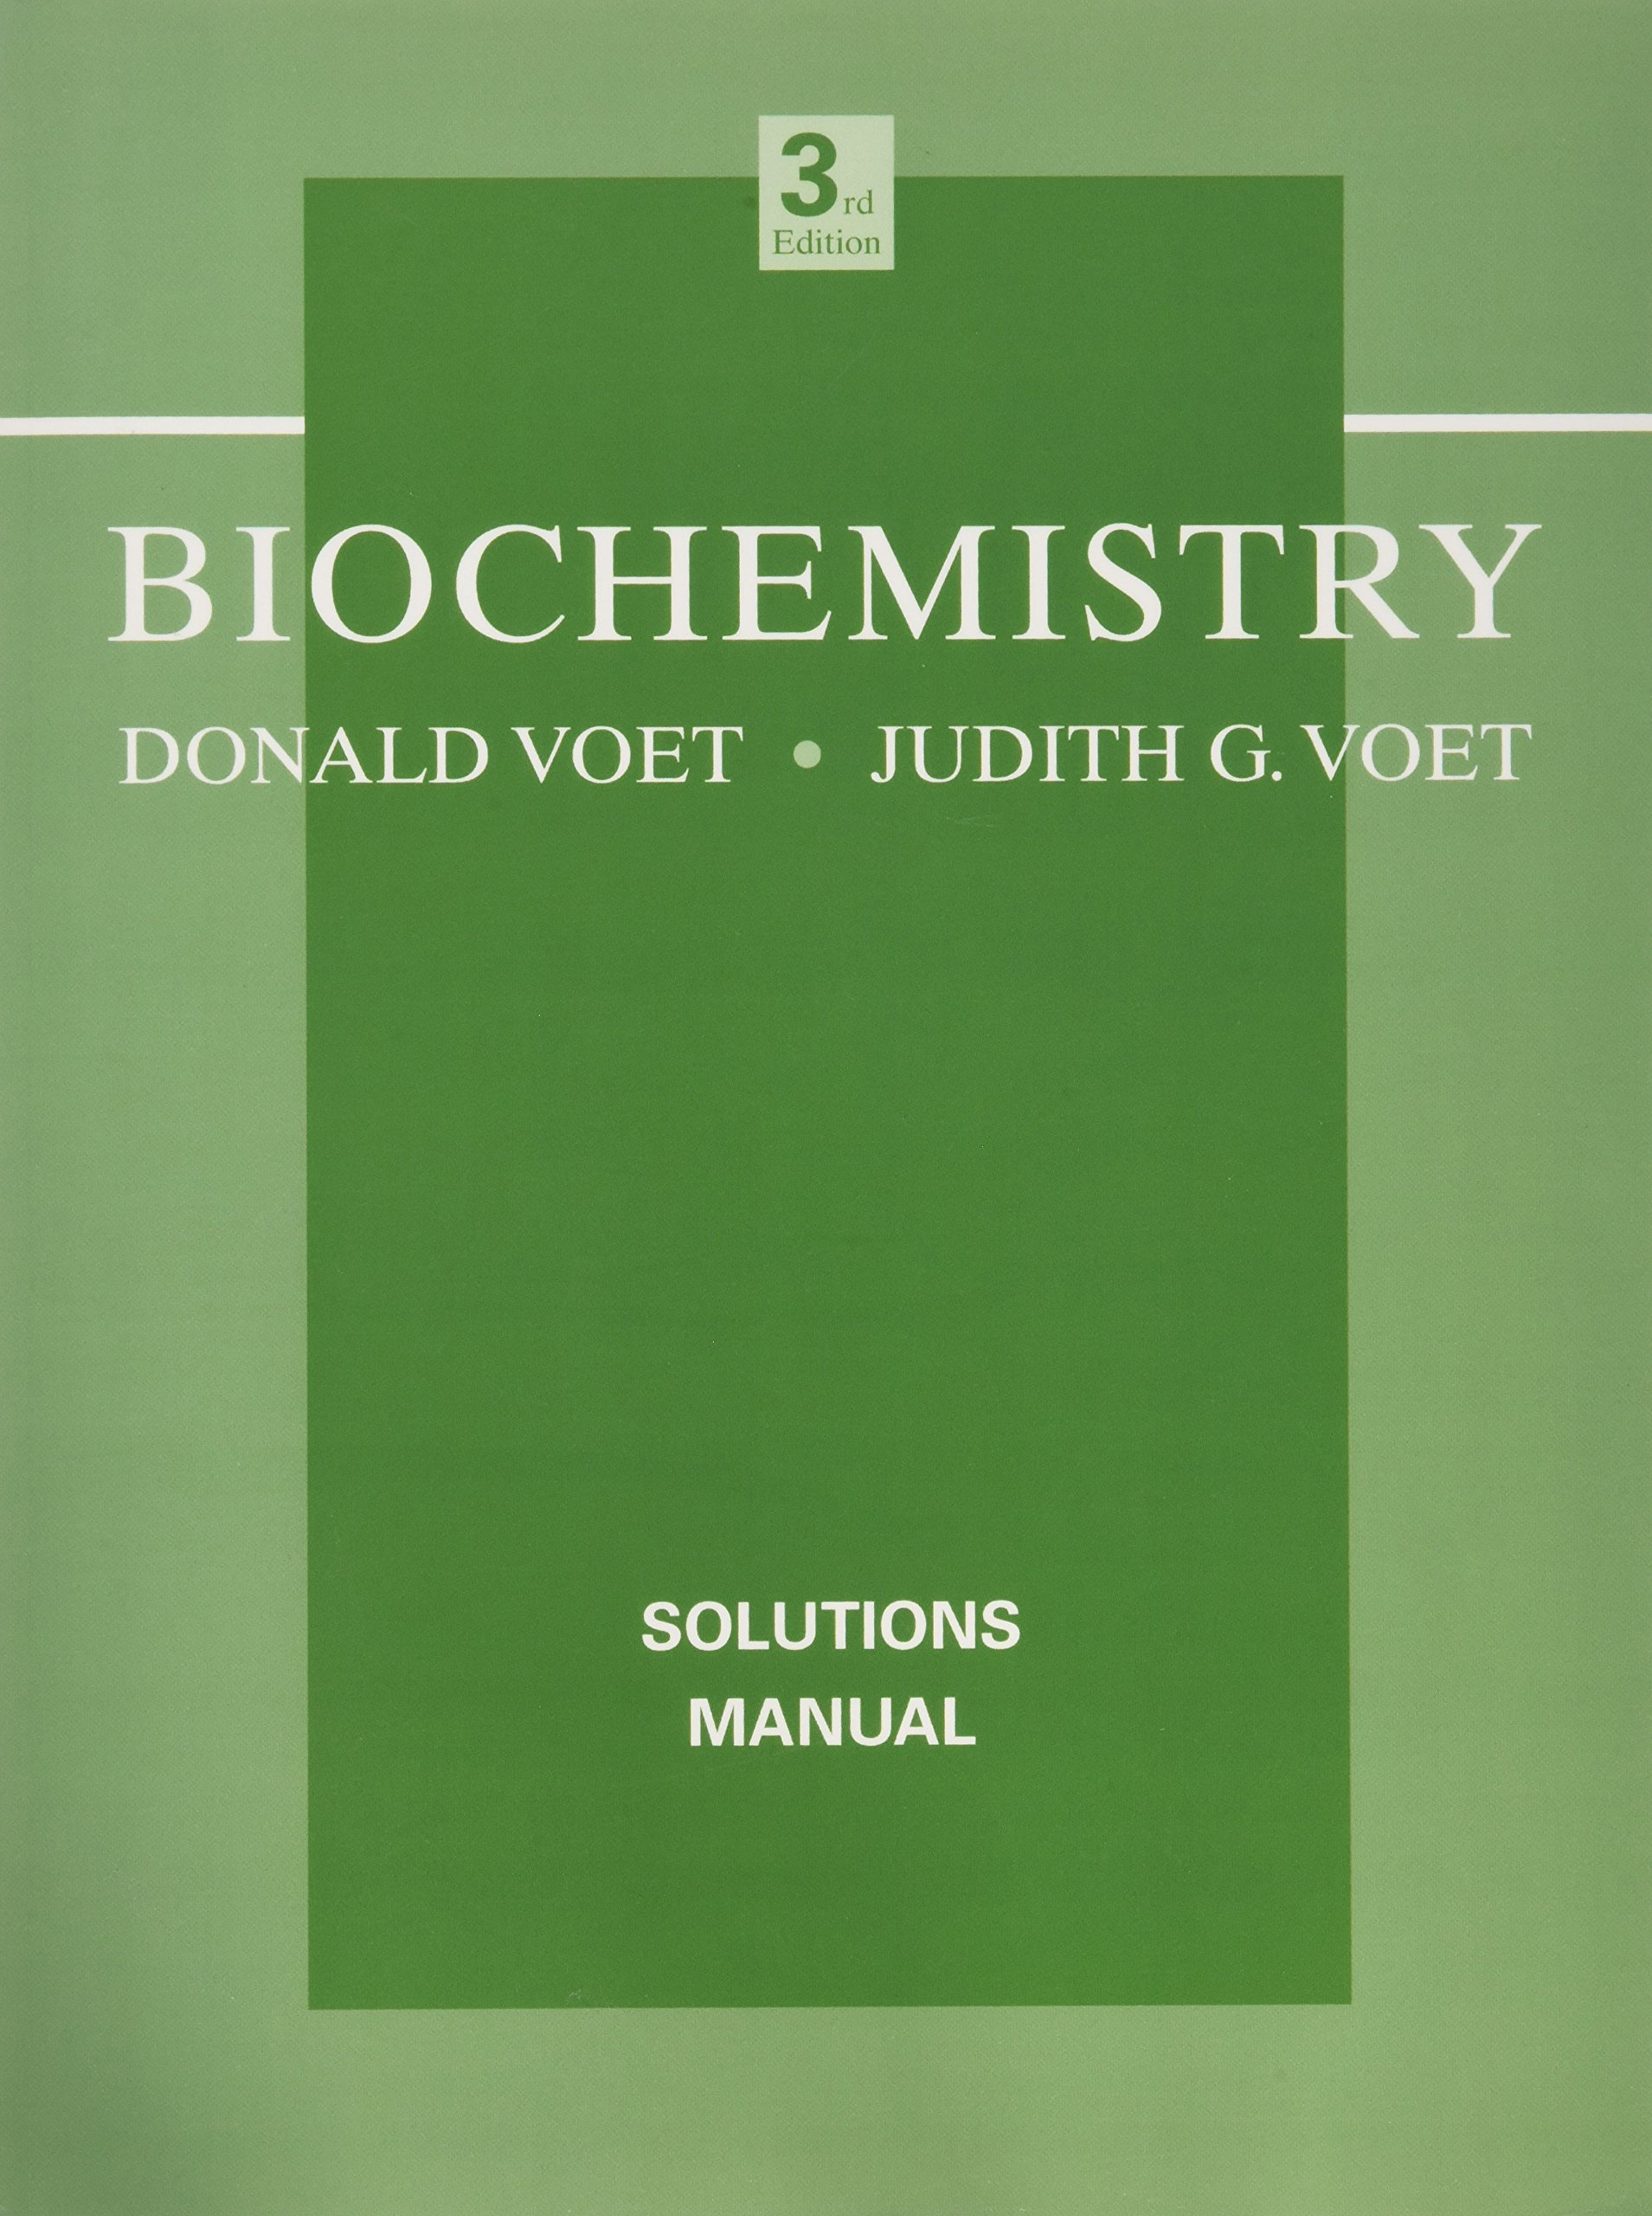 Biochemistry: Solutions Manual: Amazon.co.uk: Donald Voet, Judith G. Voet:  9780471468585: Books